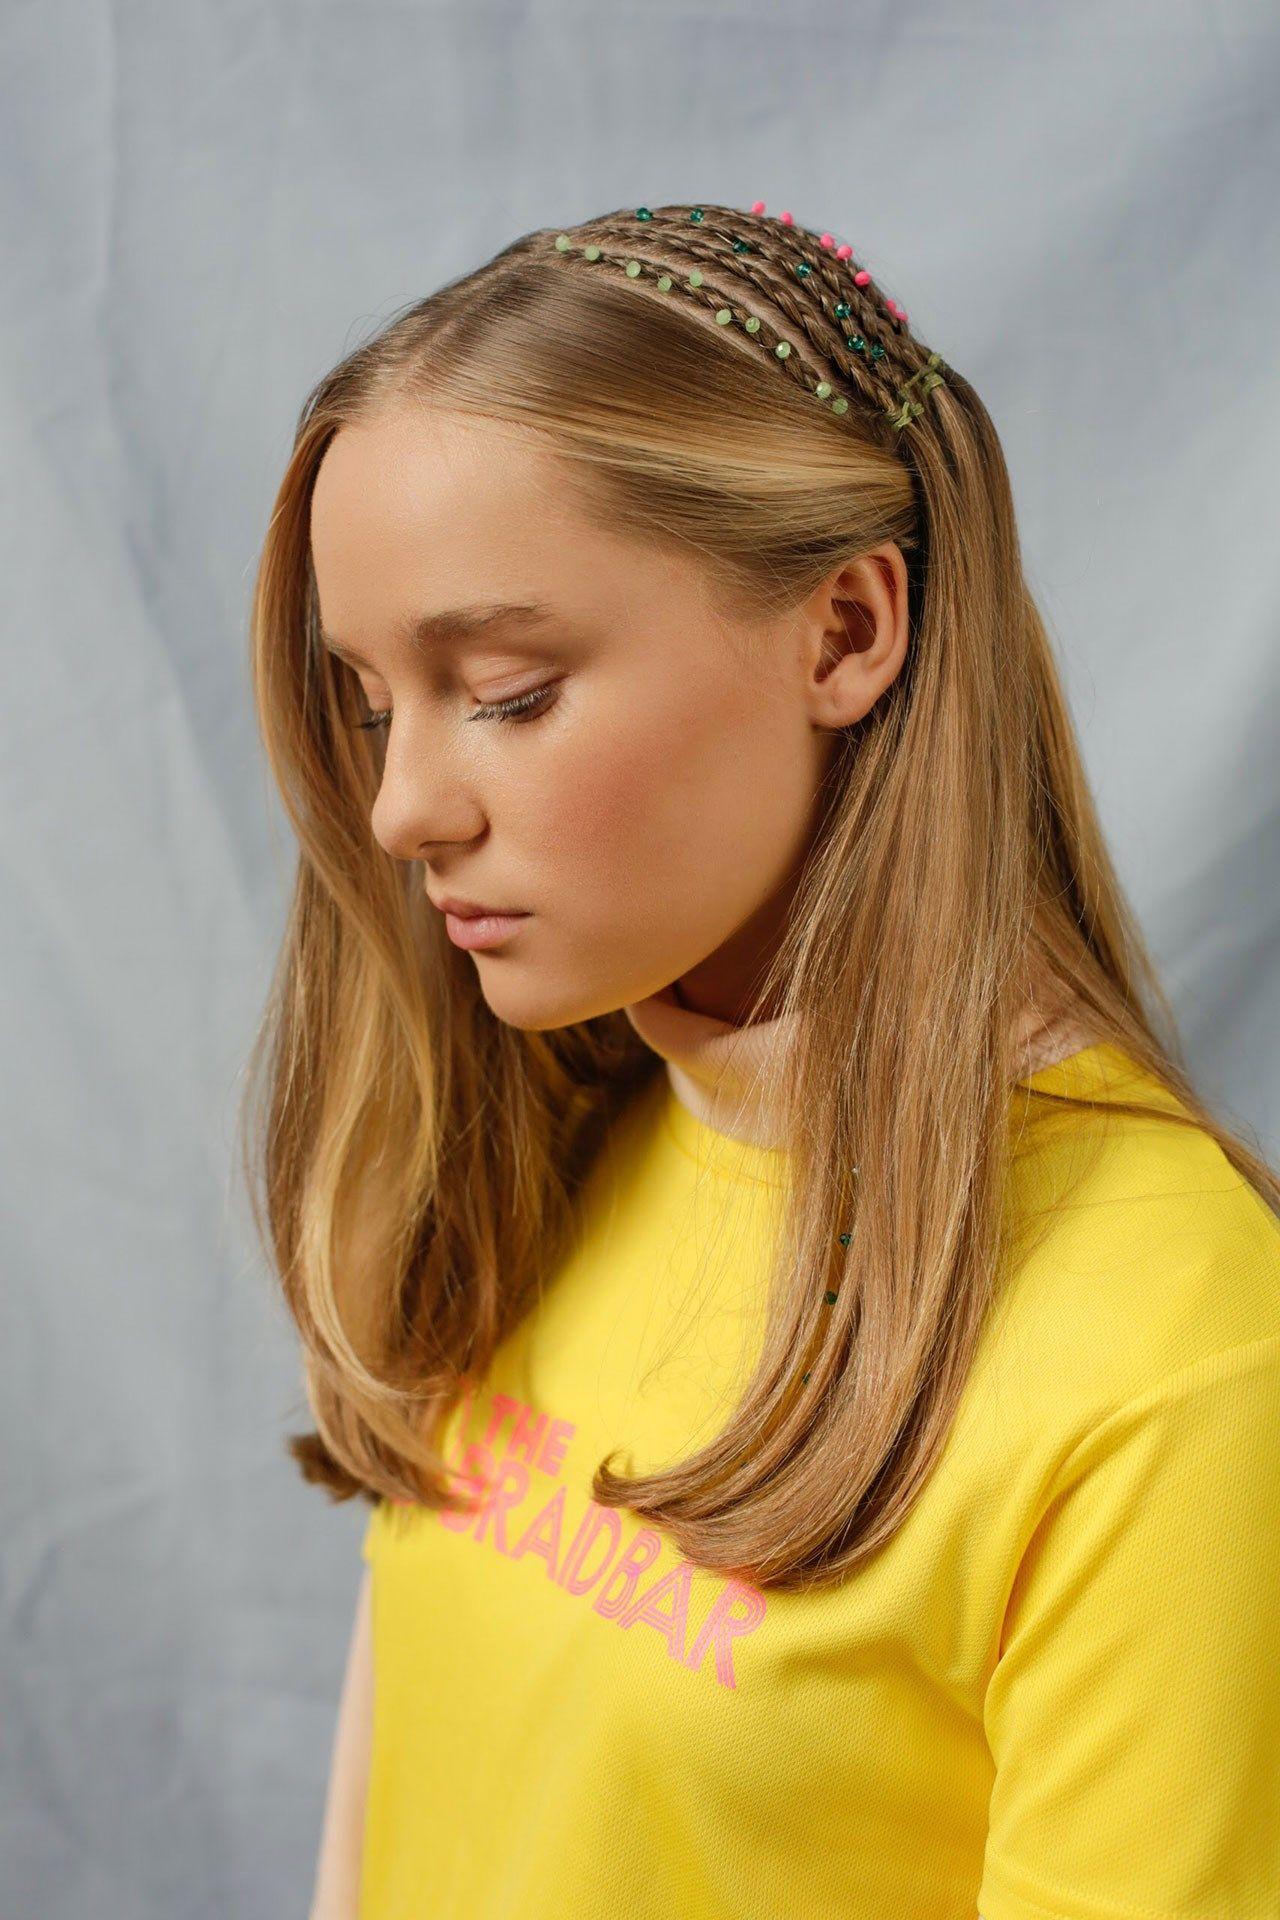 Meet the new girls inspiring the Braid Bars new styles